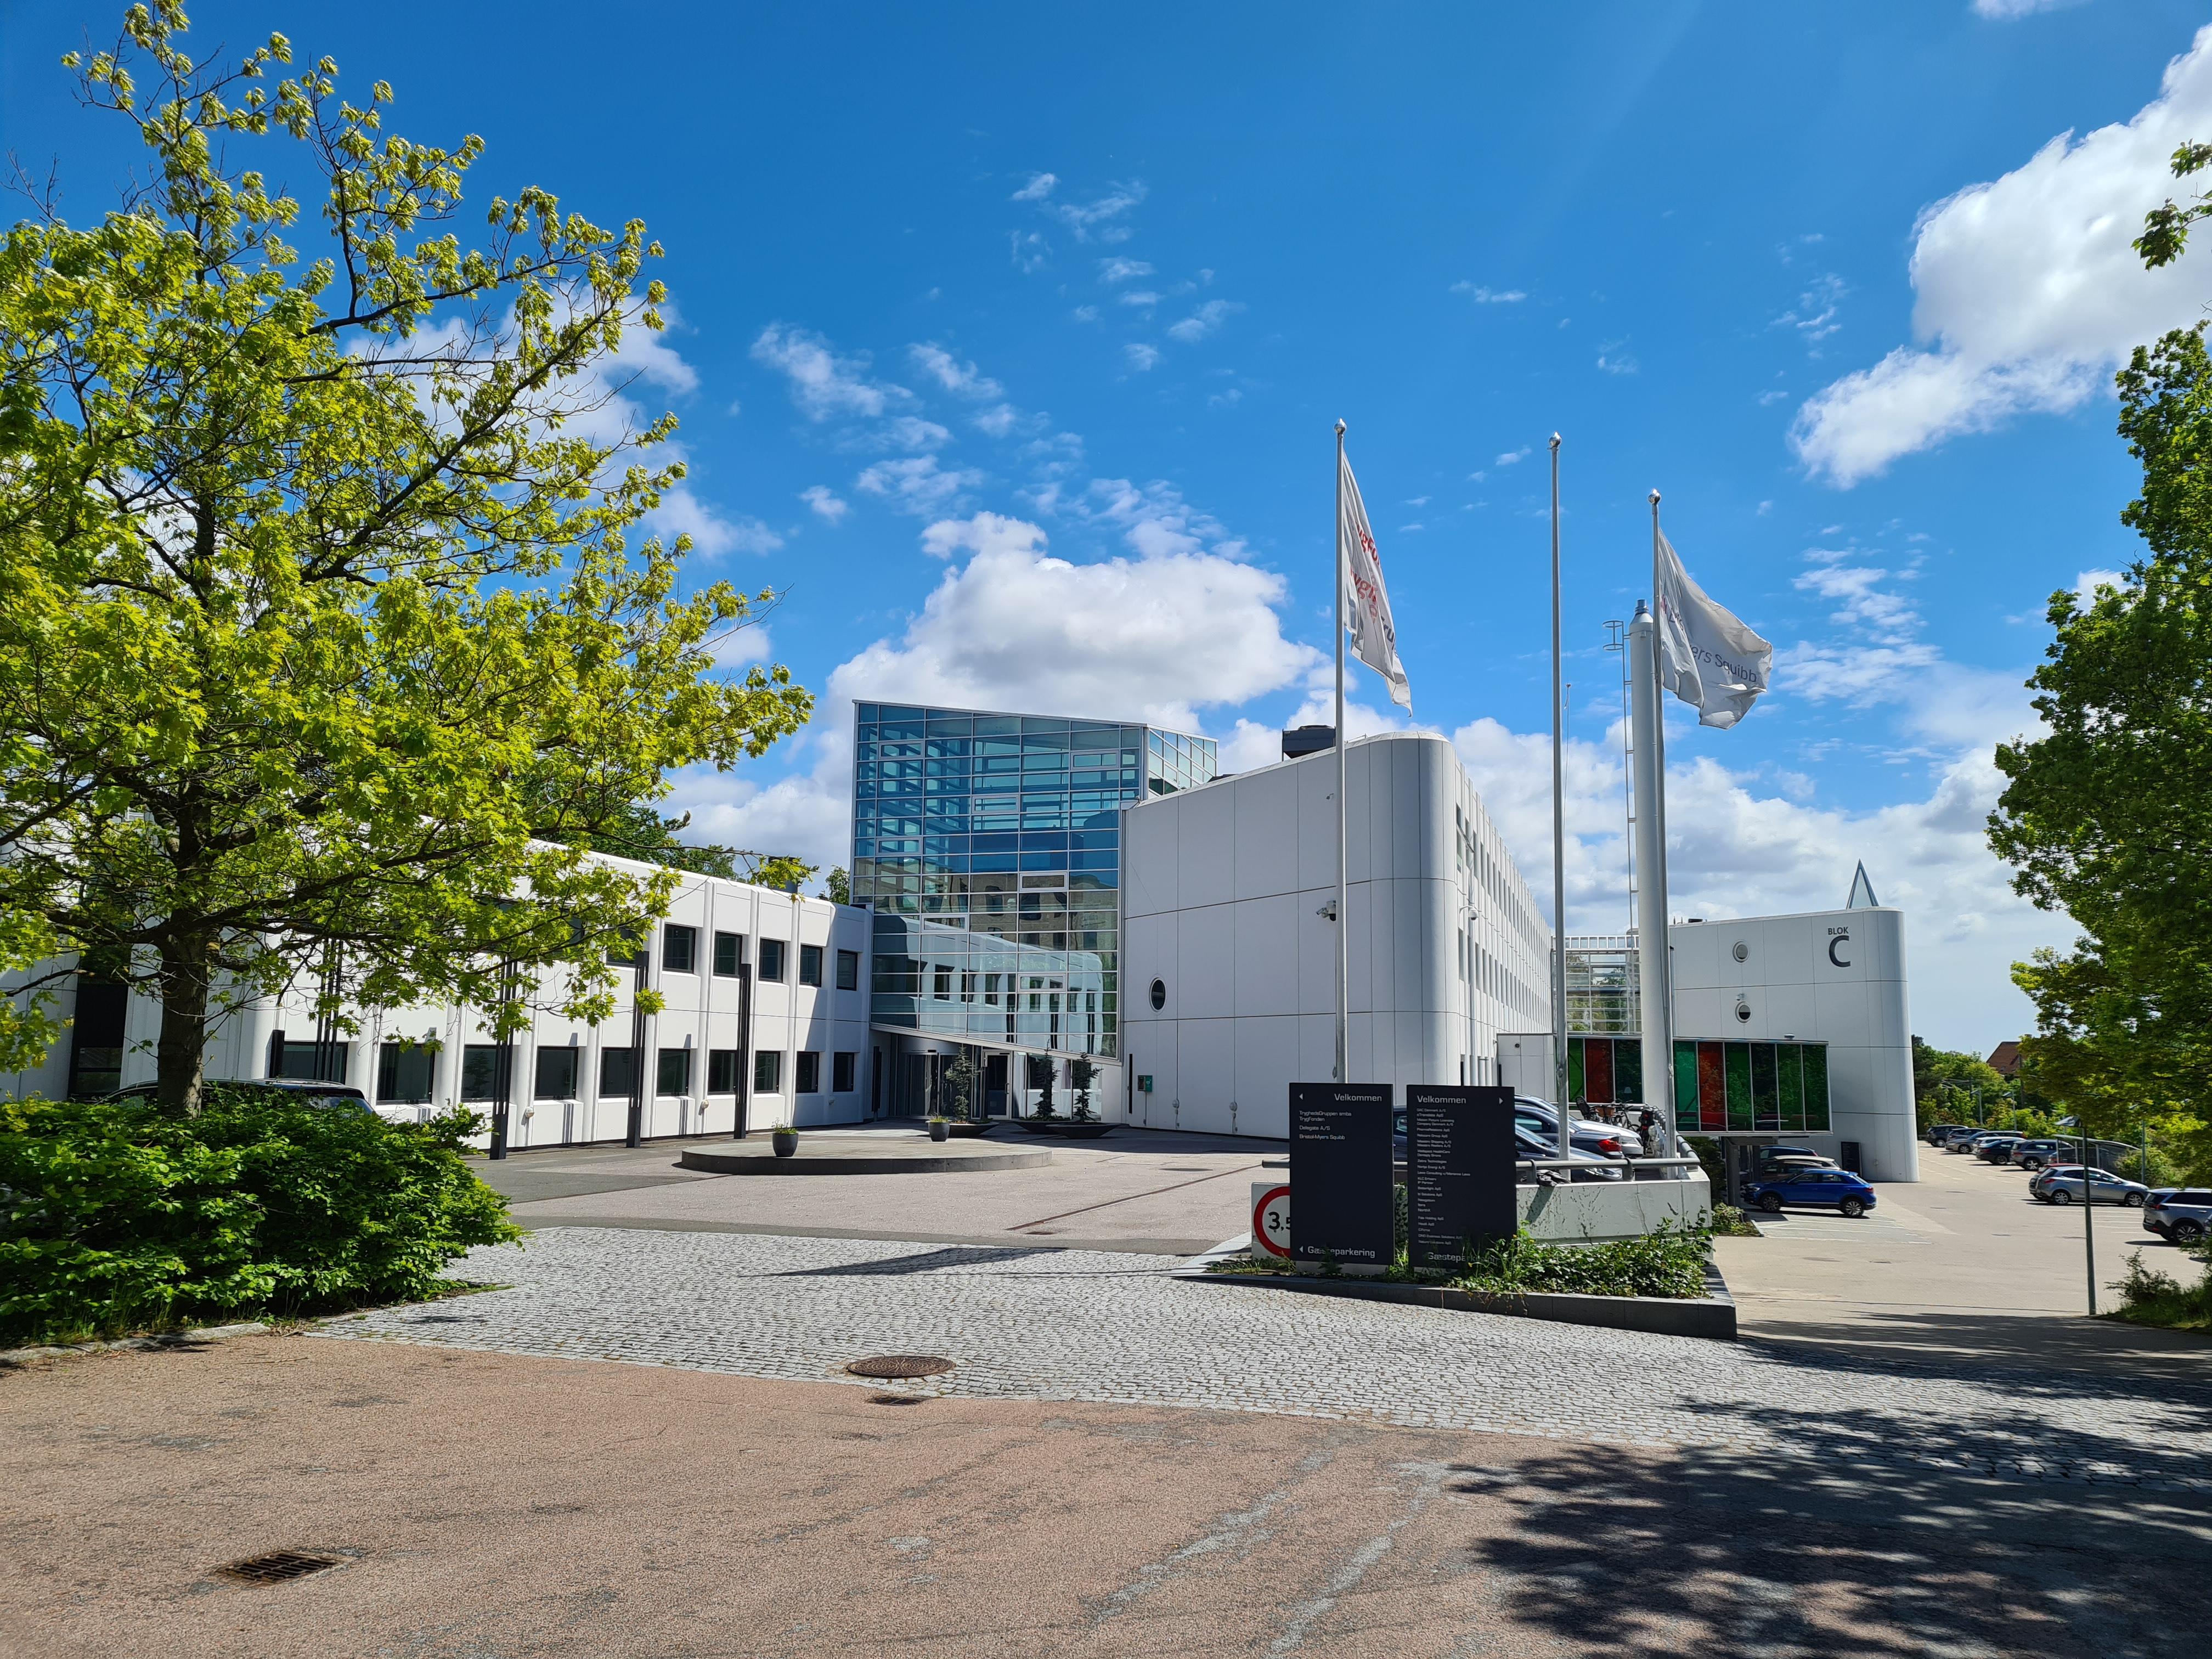 Itera DK Office